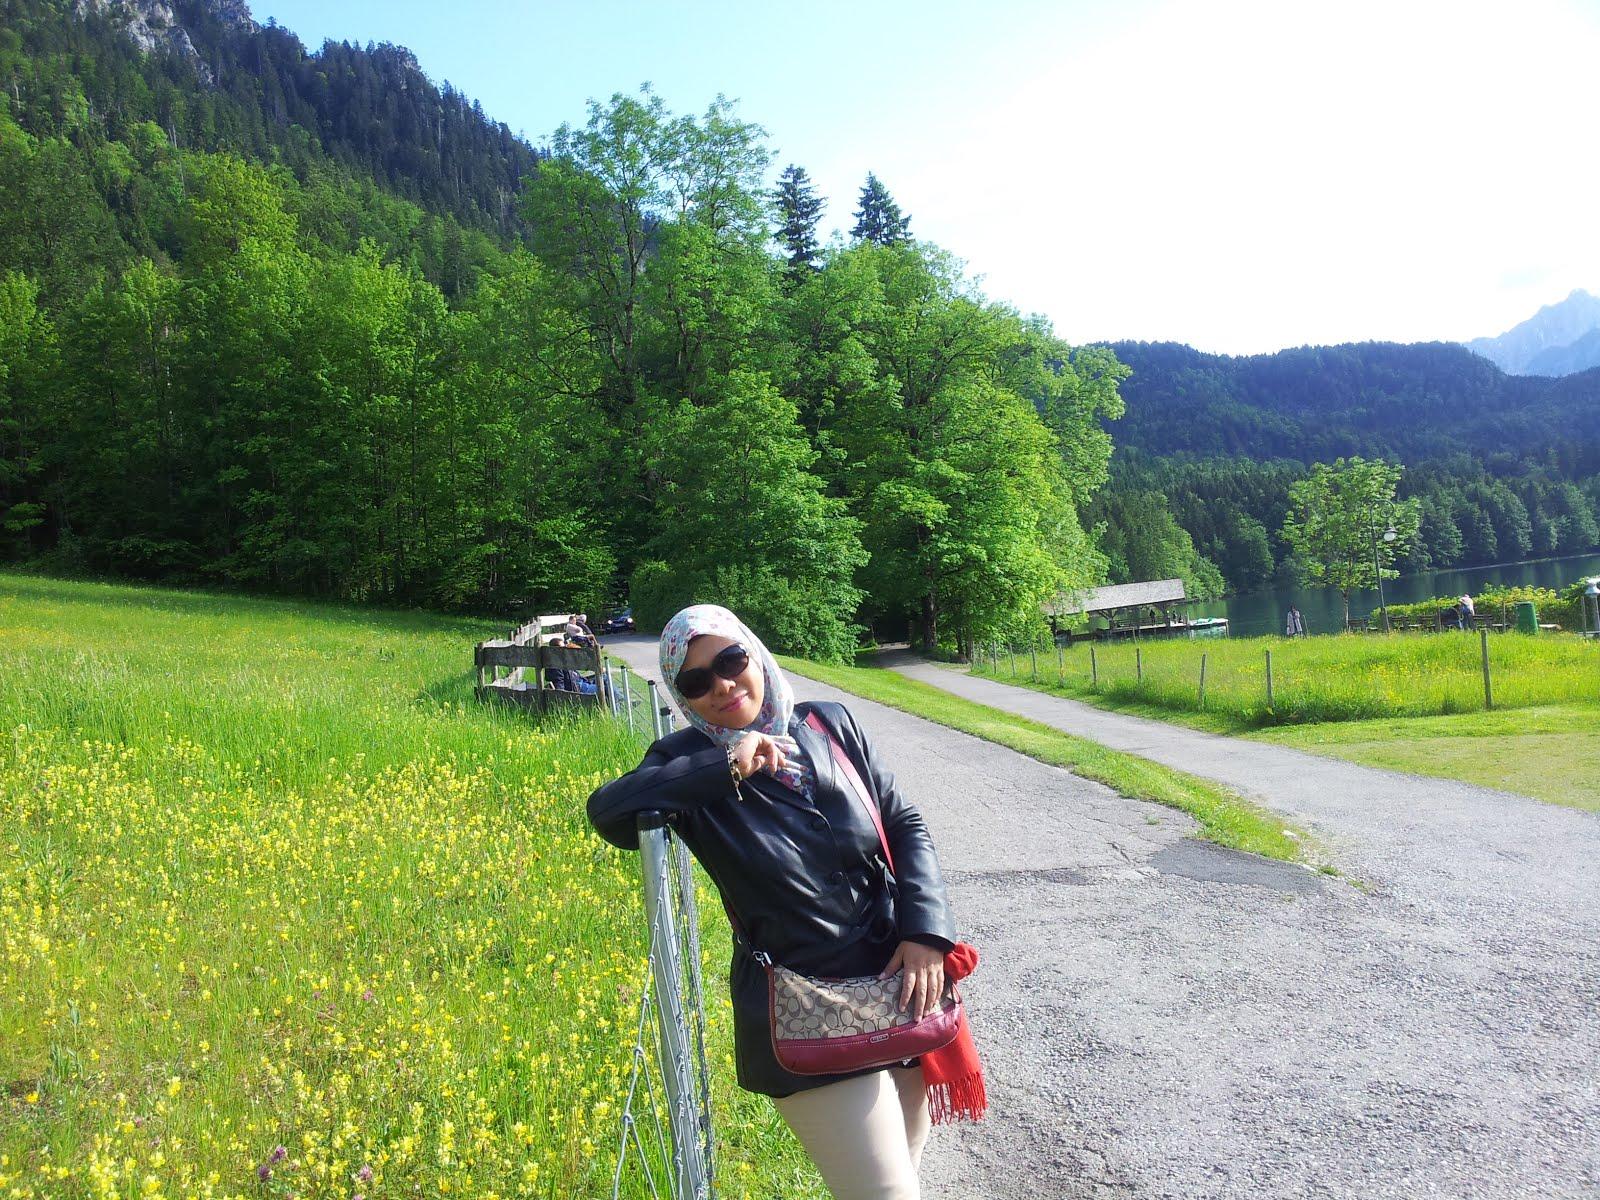 INSBRUCK, AUSTRIA